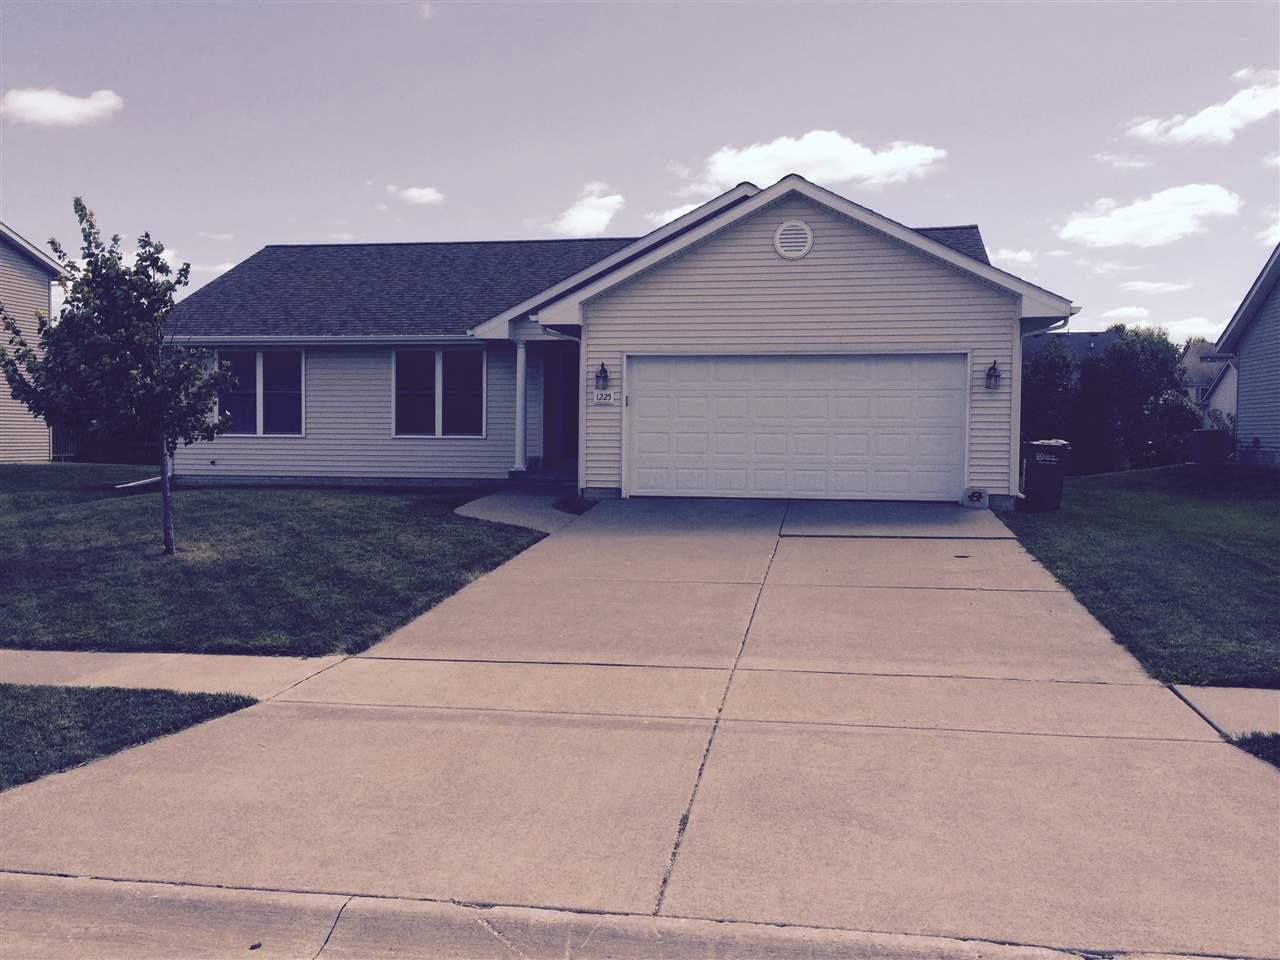 Rental Homes for Rent, ListingId:35079759, location: 1225 W 61ST Davenport 52804